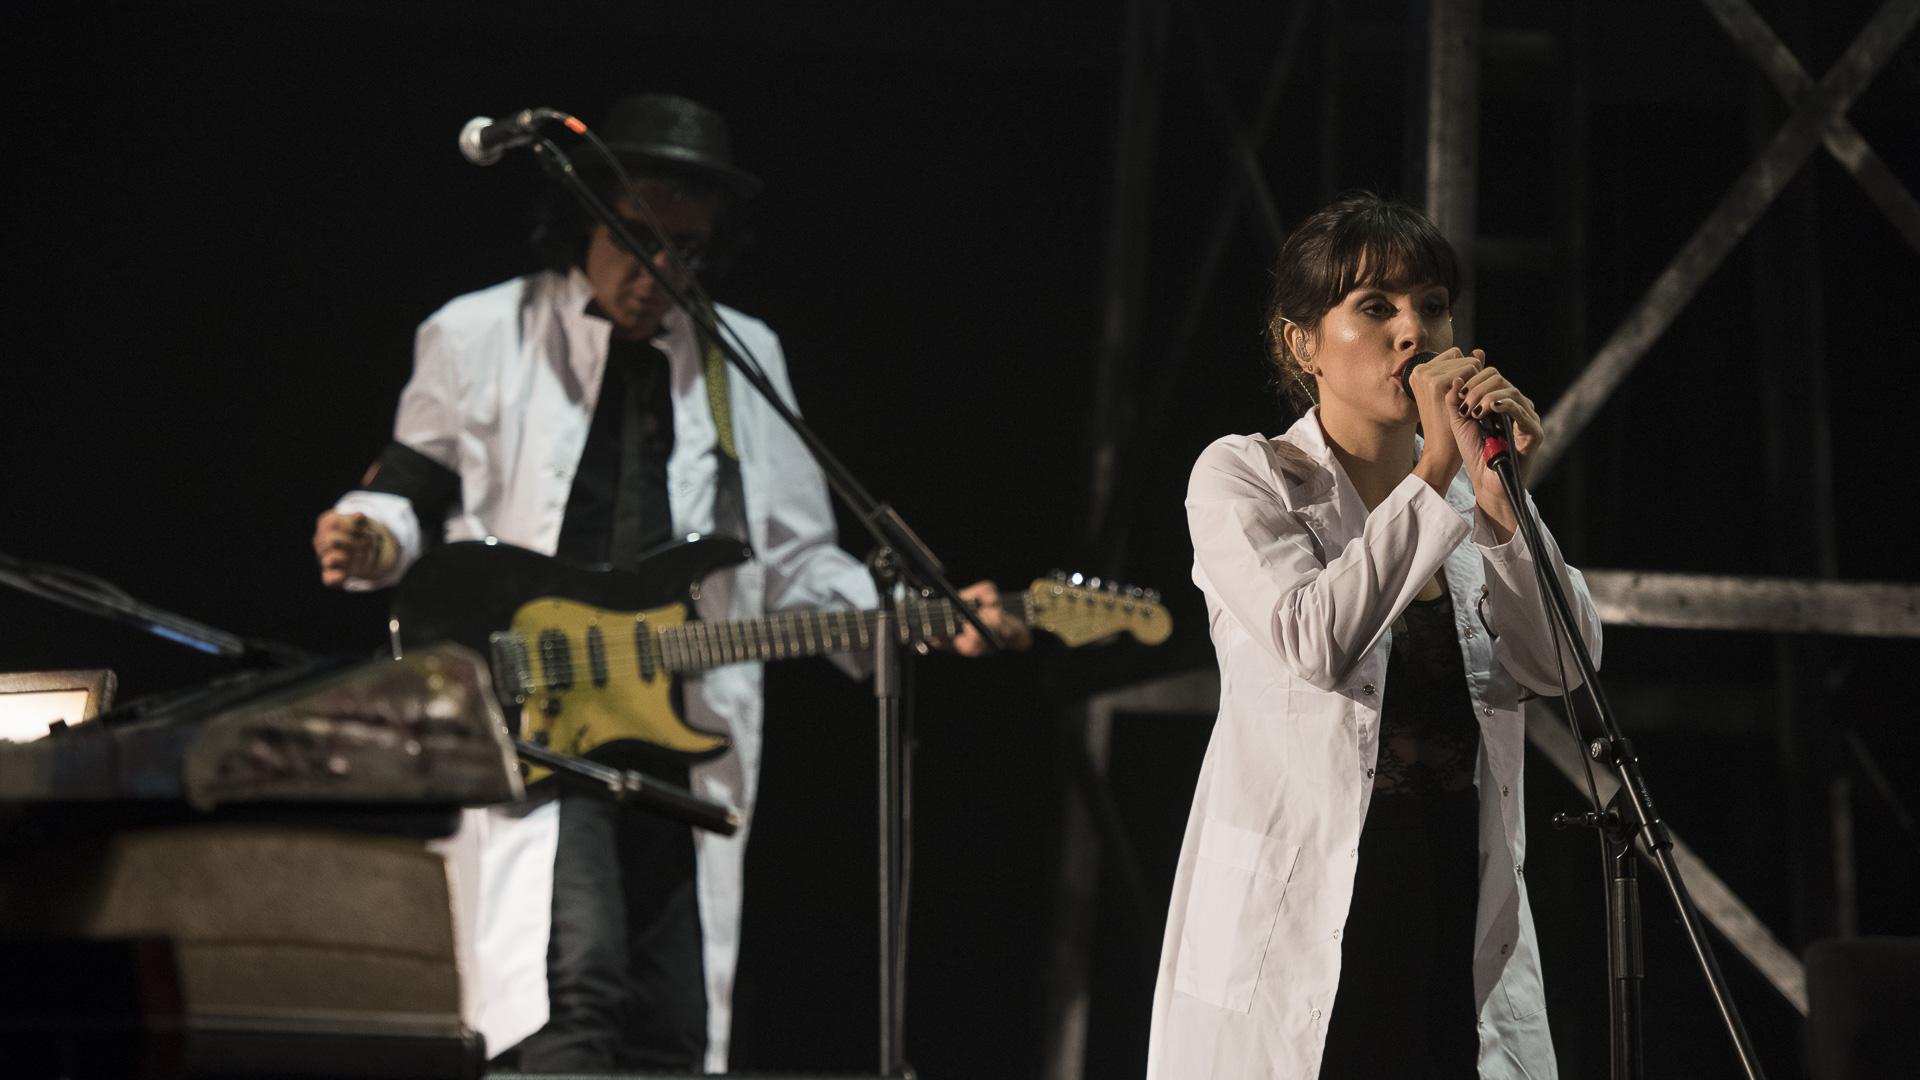 La banda de Charly sonó impecable. (Foto: Adrián Escandar)